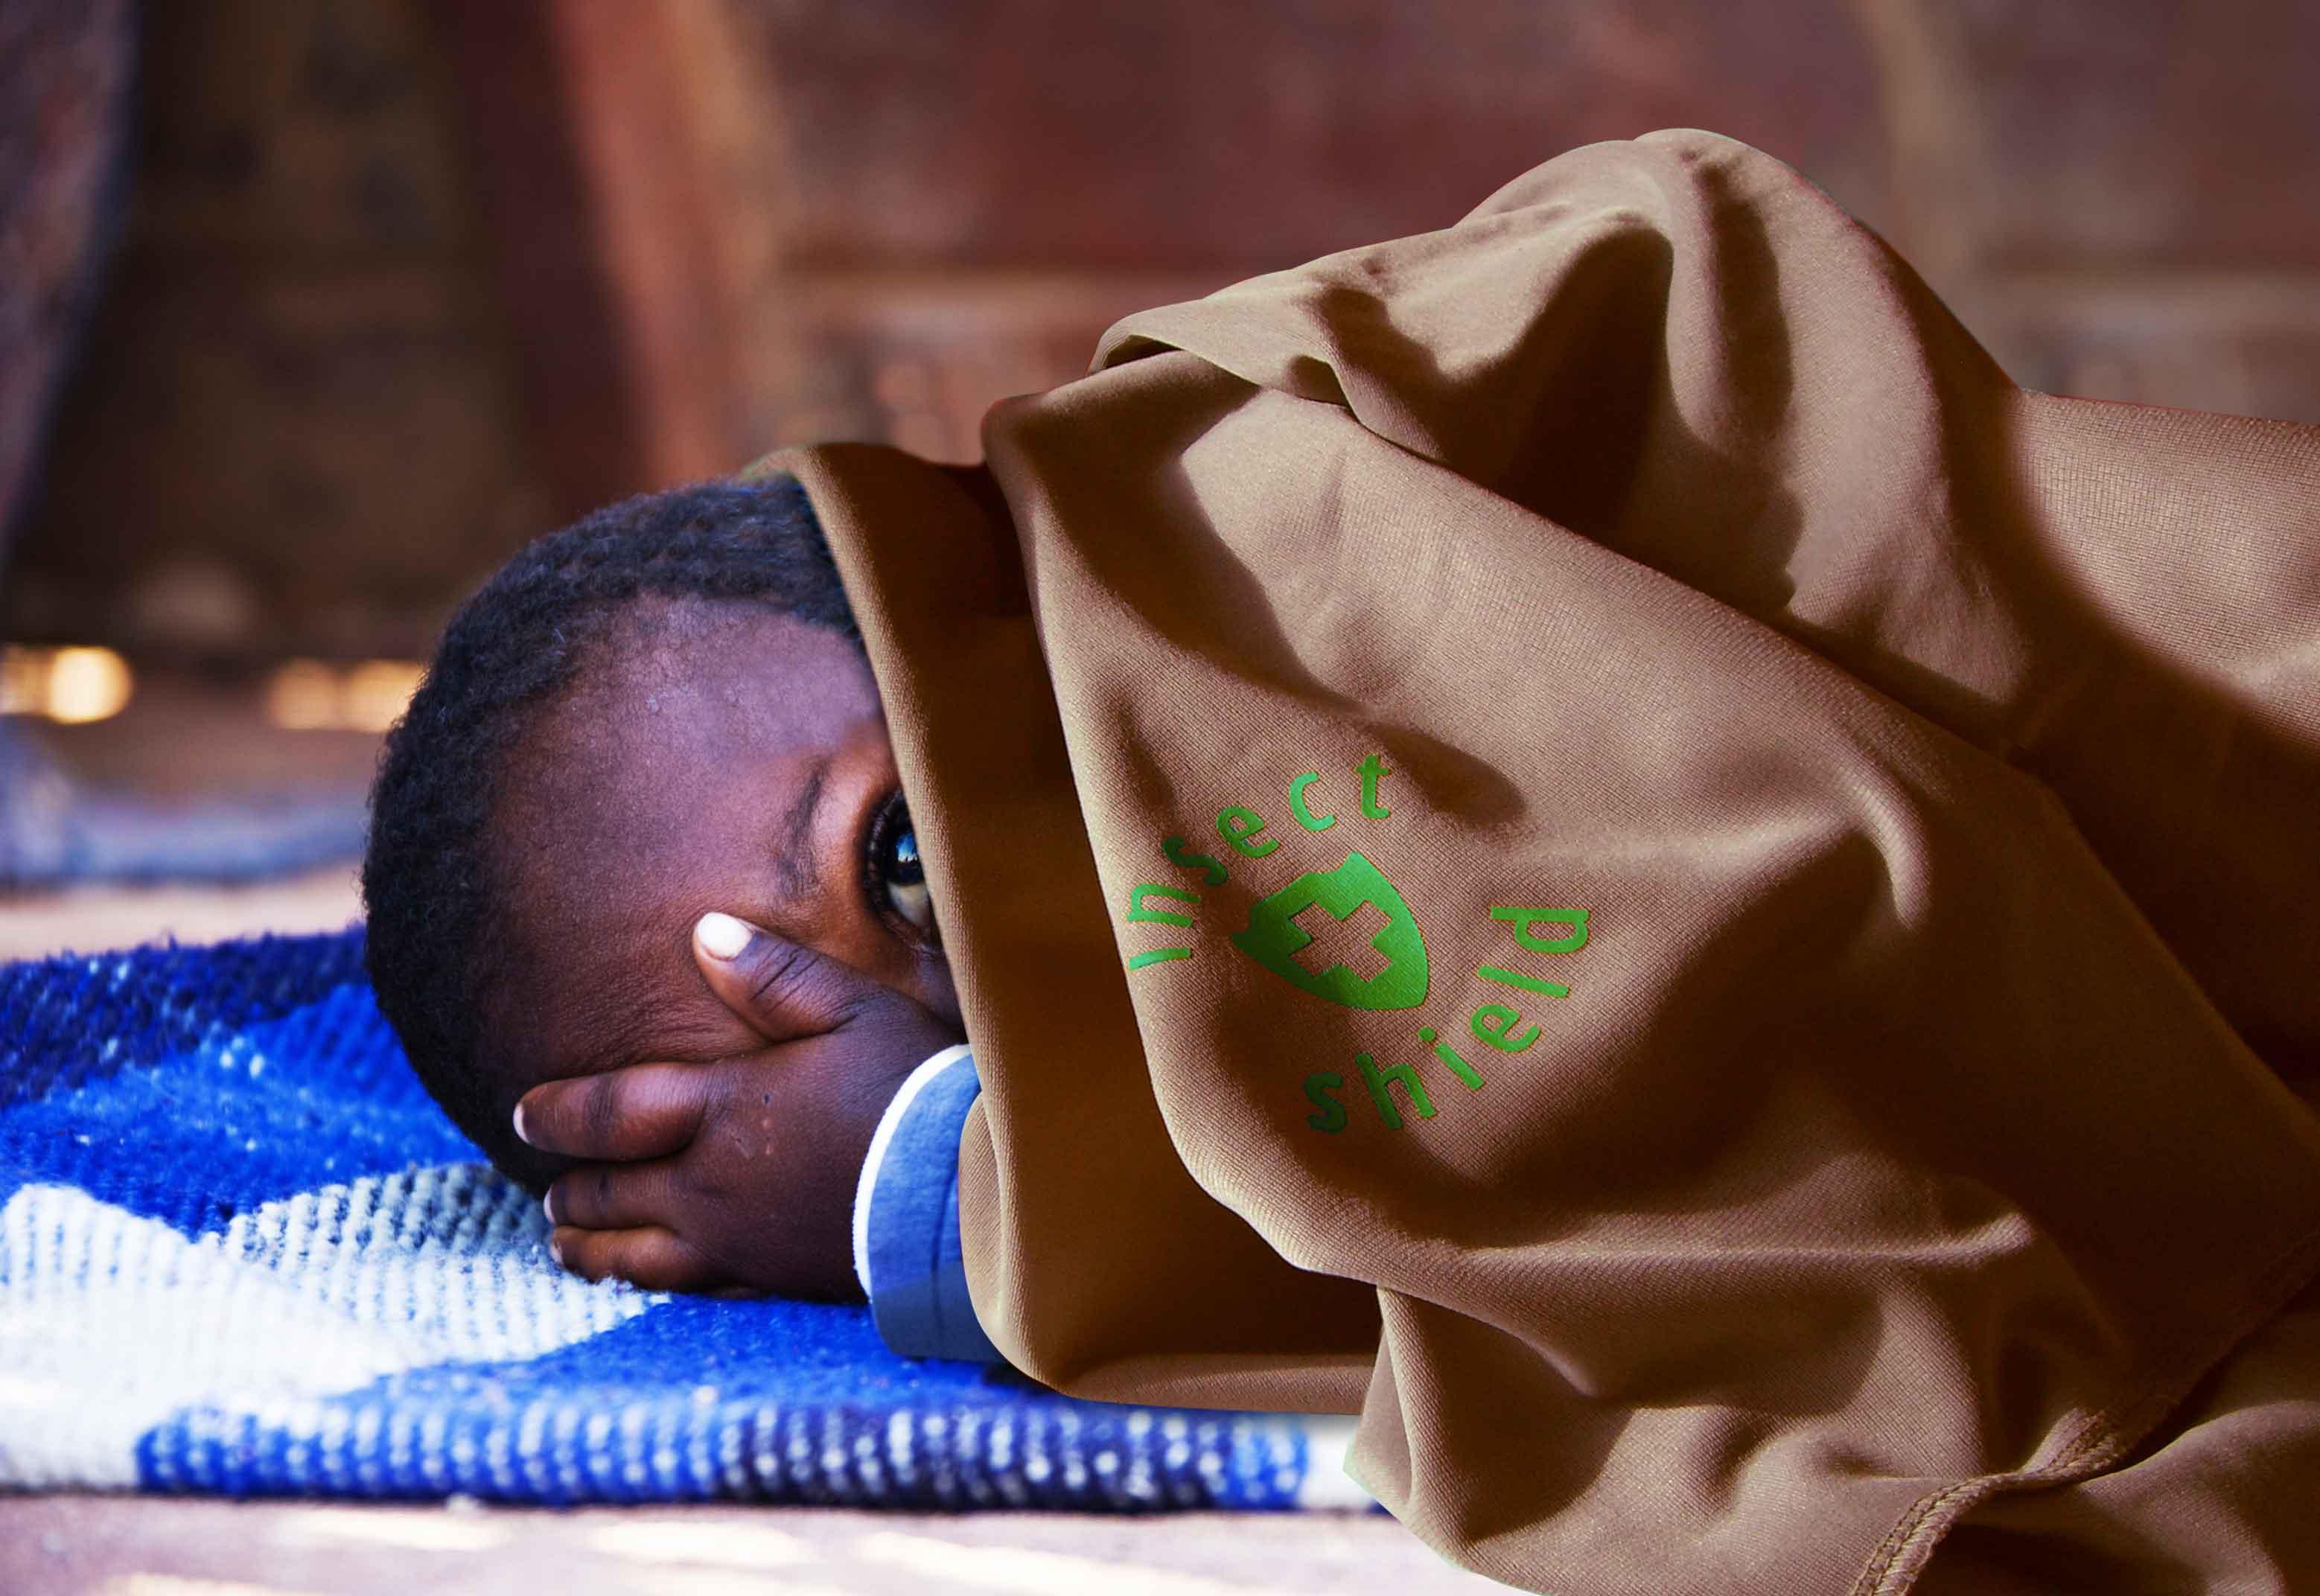 Blanket For Poor